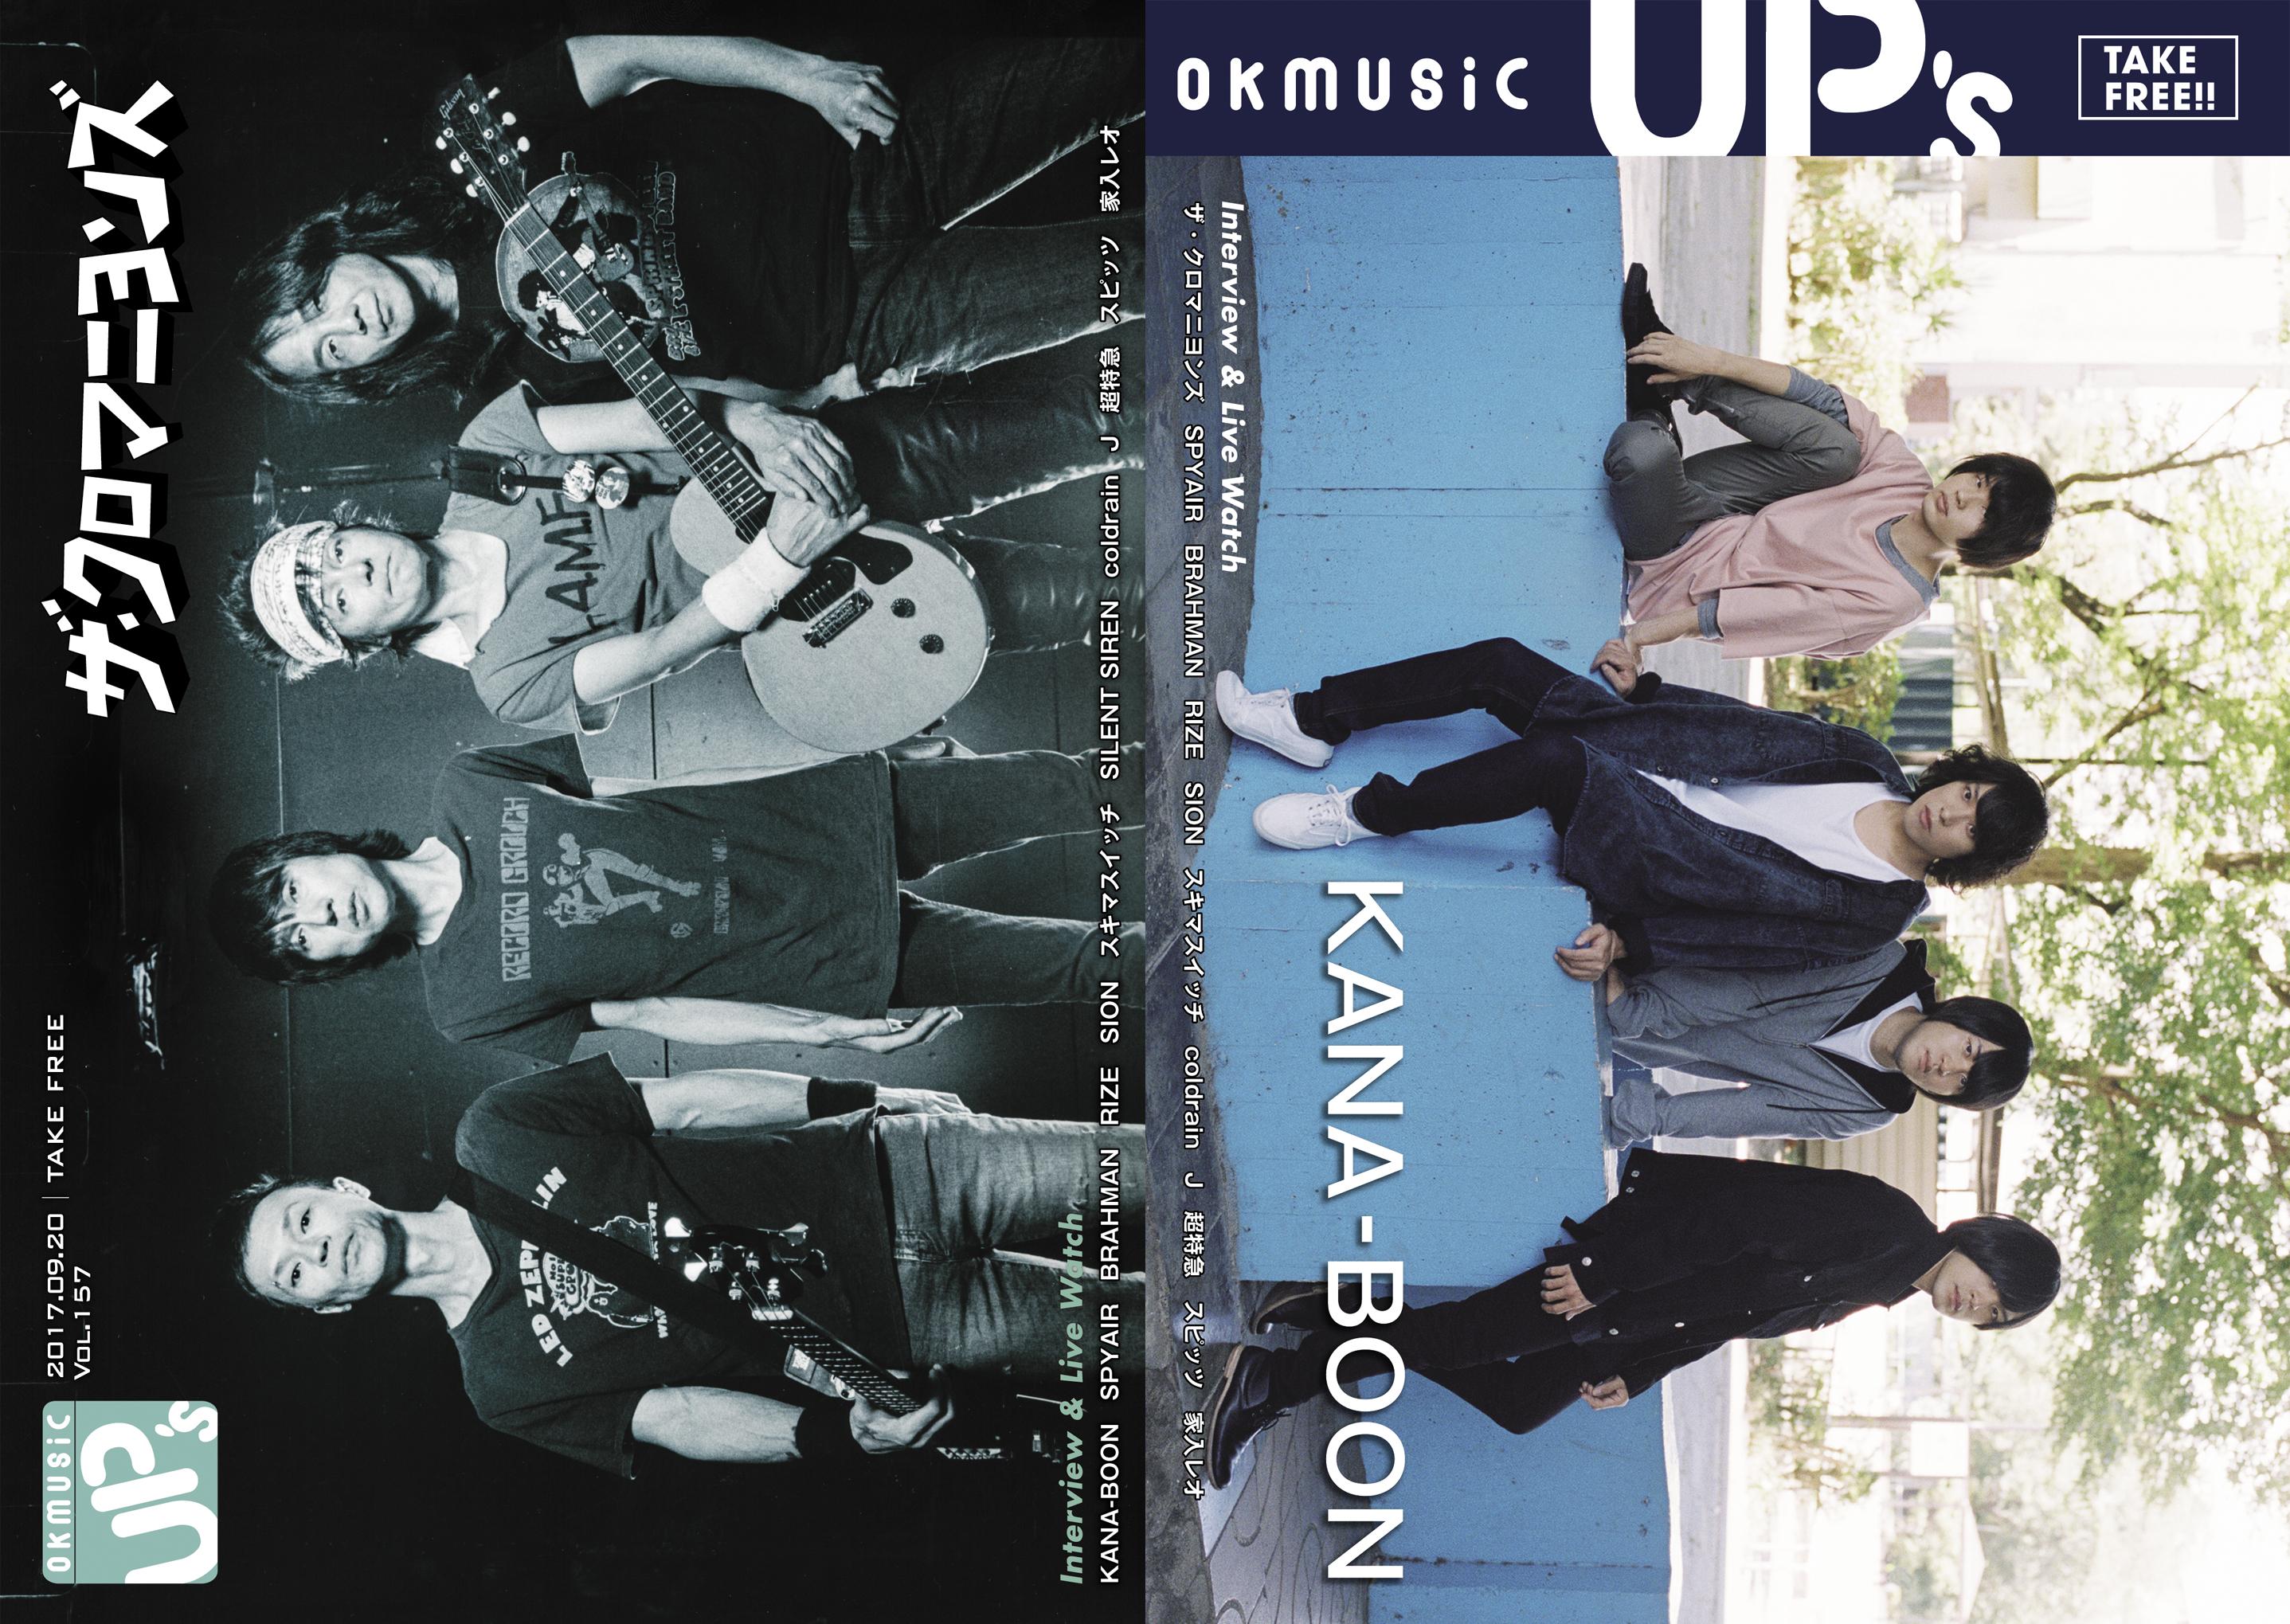 THE PINBALLS、セルフカバーアルバム『Dress up』の全曲試聴